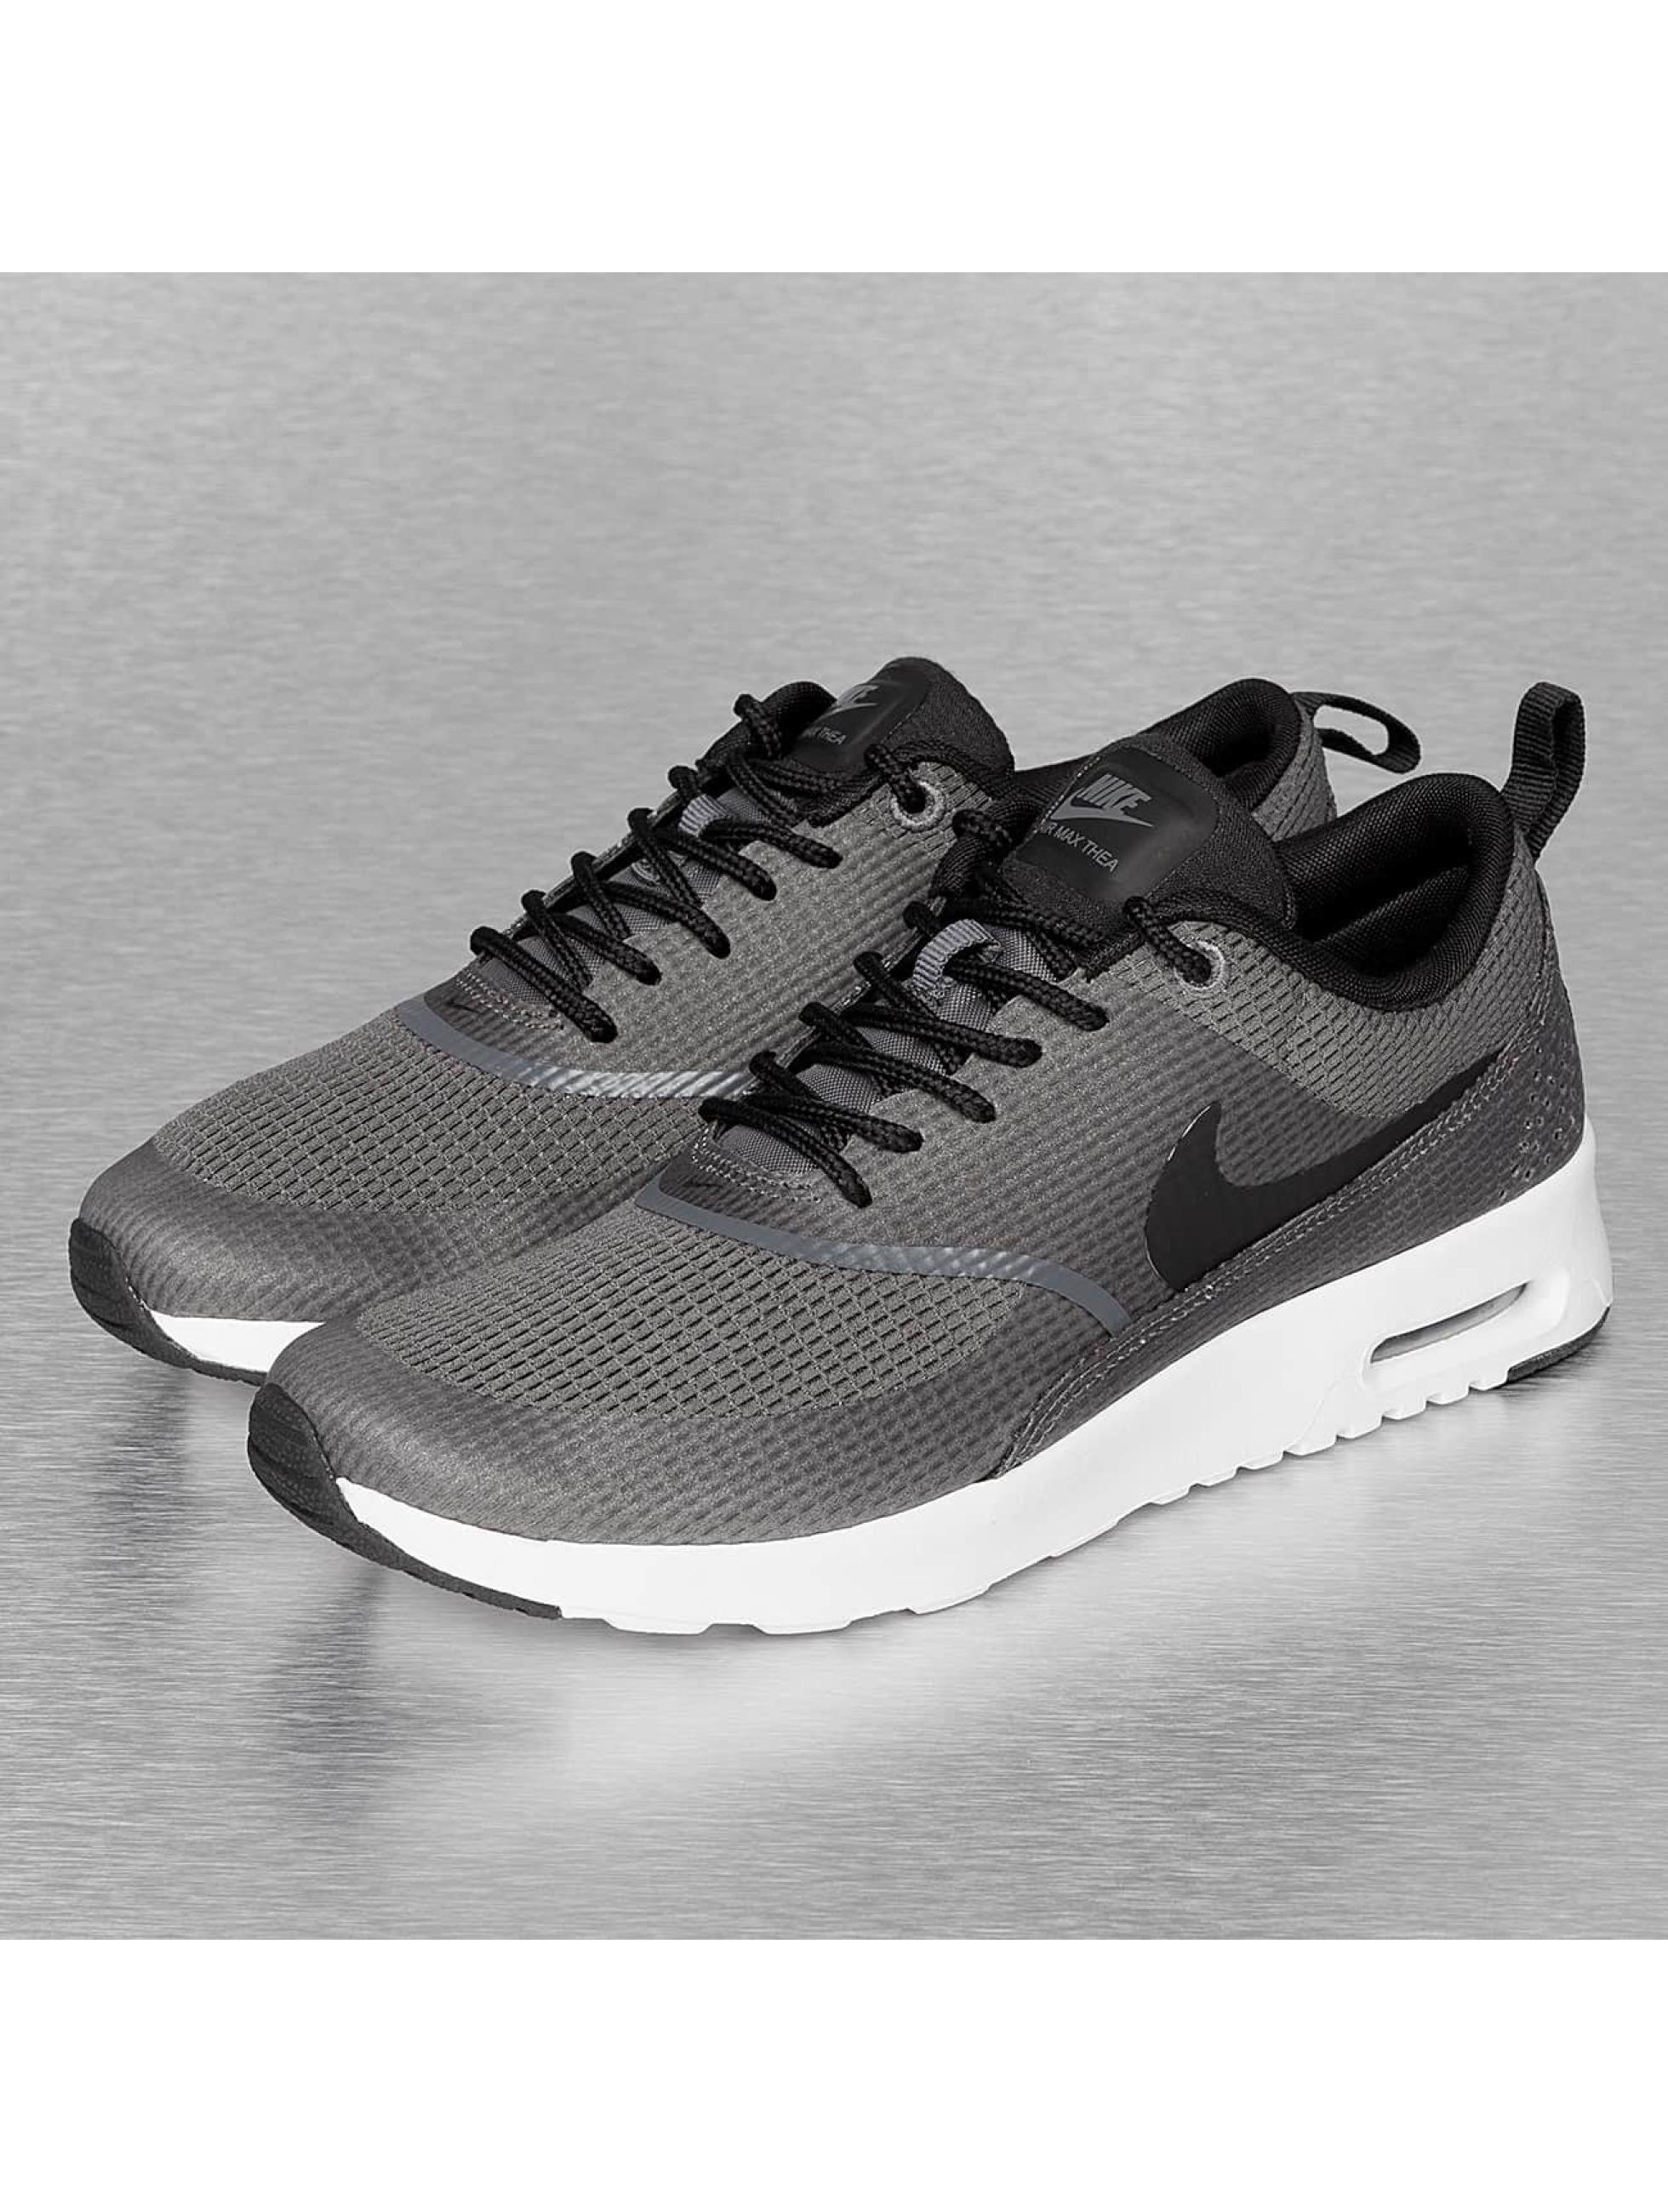 Nike Air Max Thea Premium Grijs